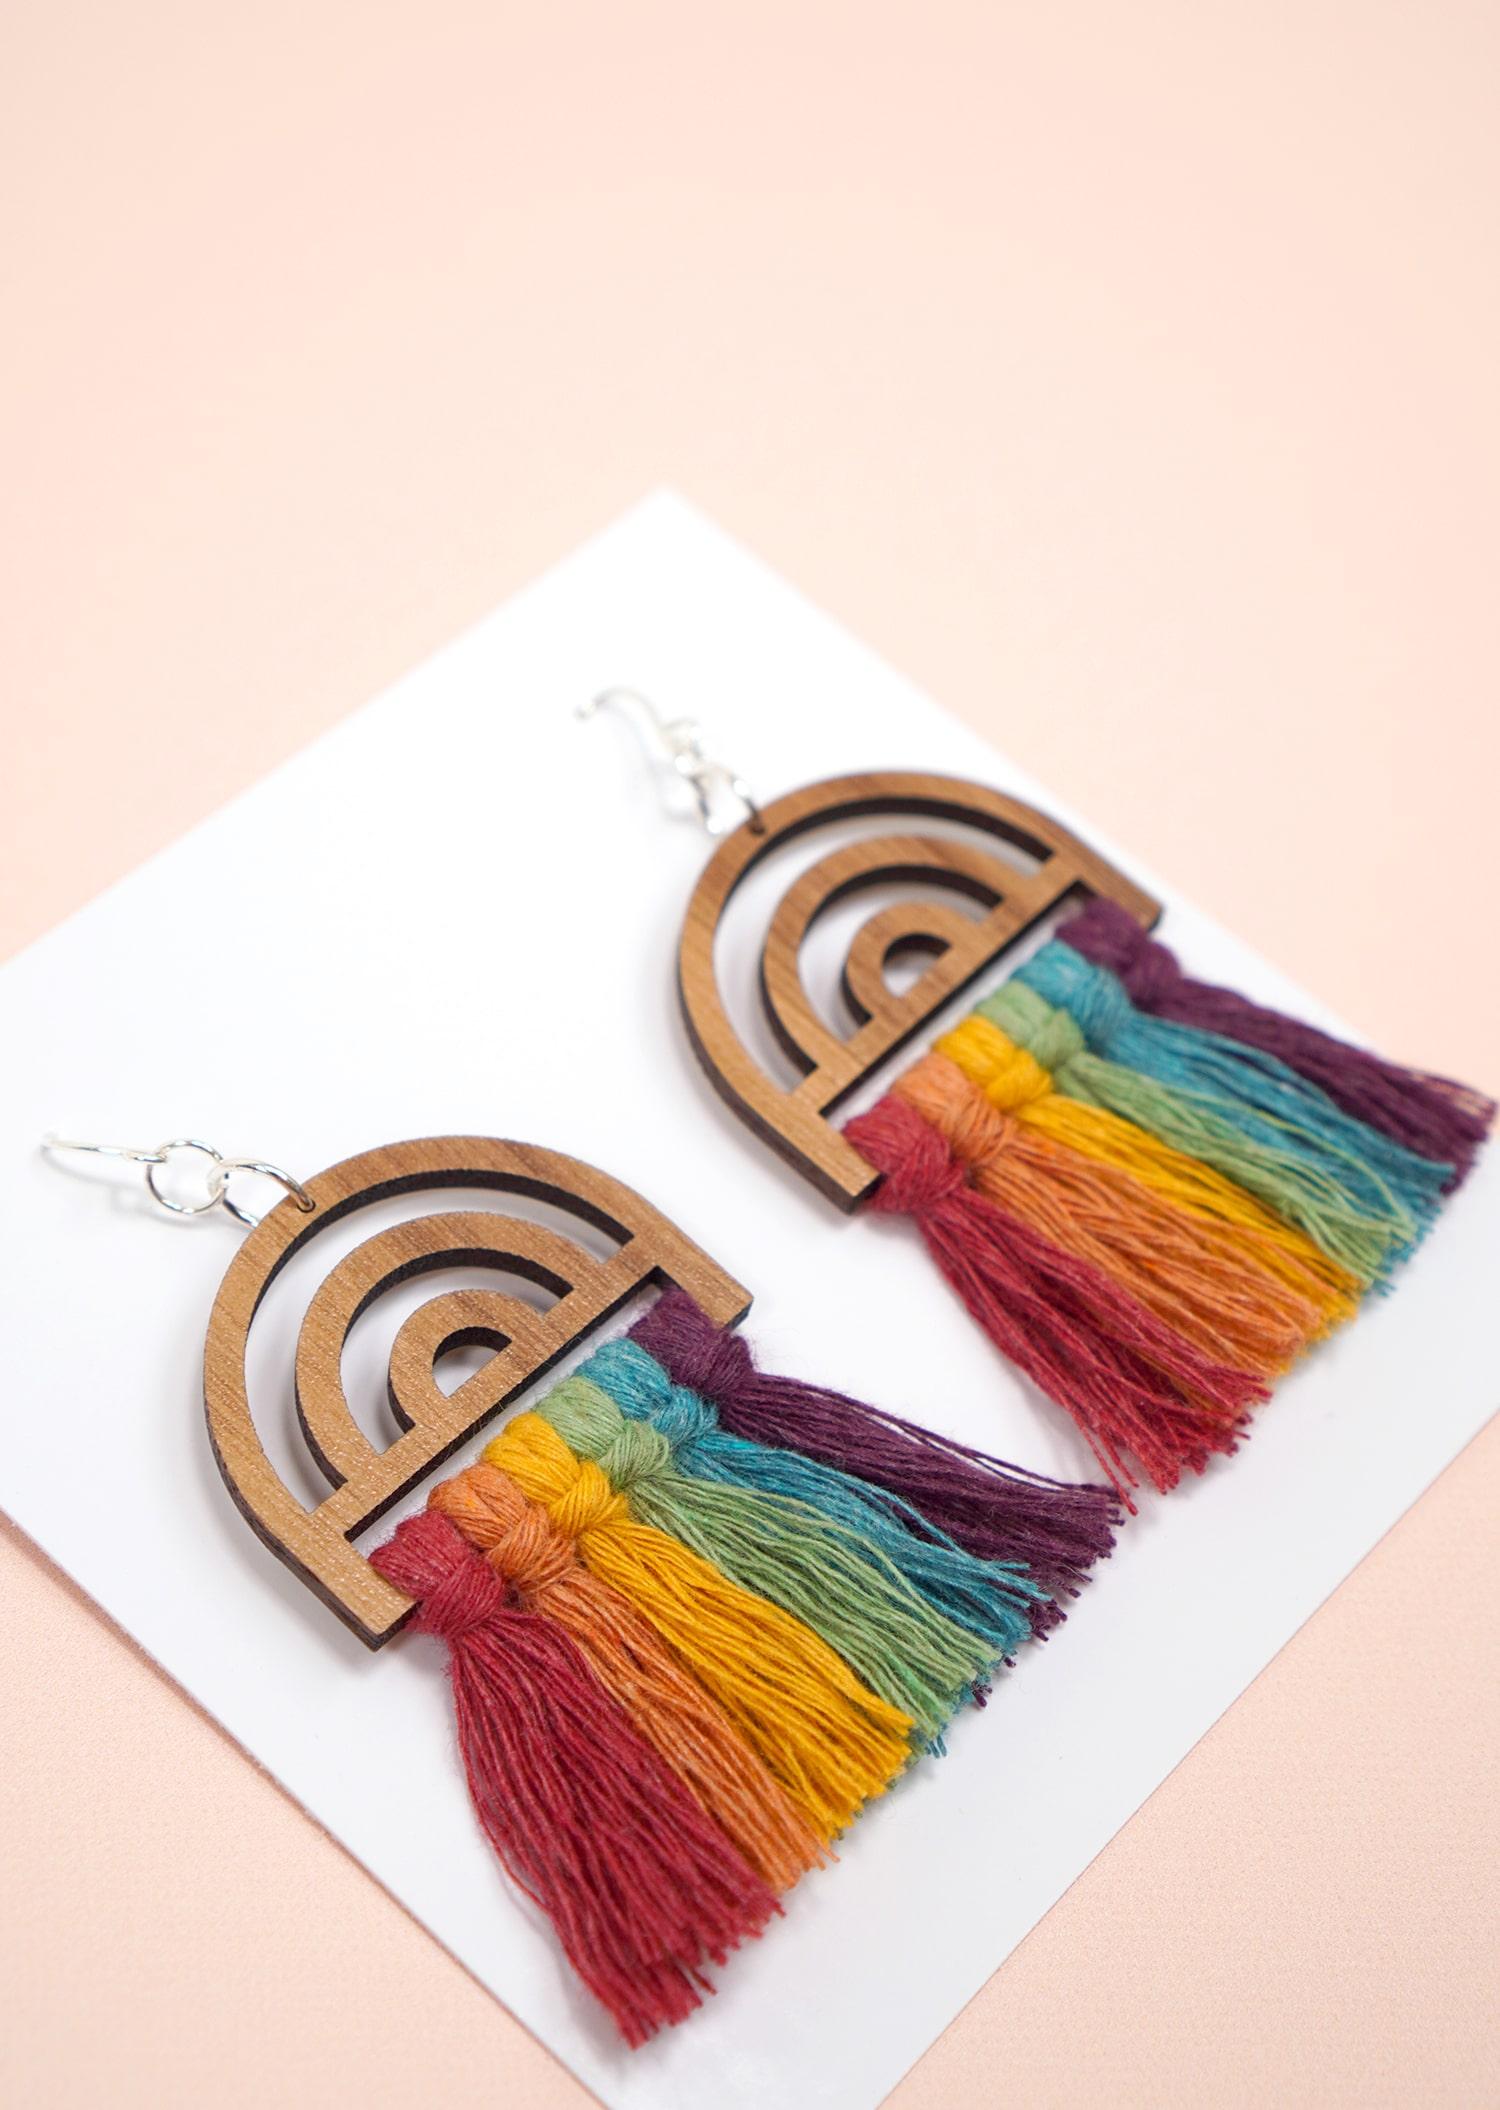 Rainbow Macrame Earrings with Wood Findings on peach background